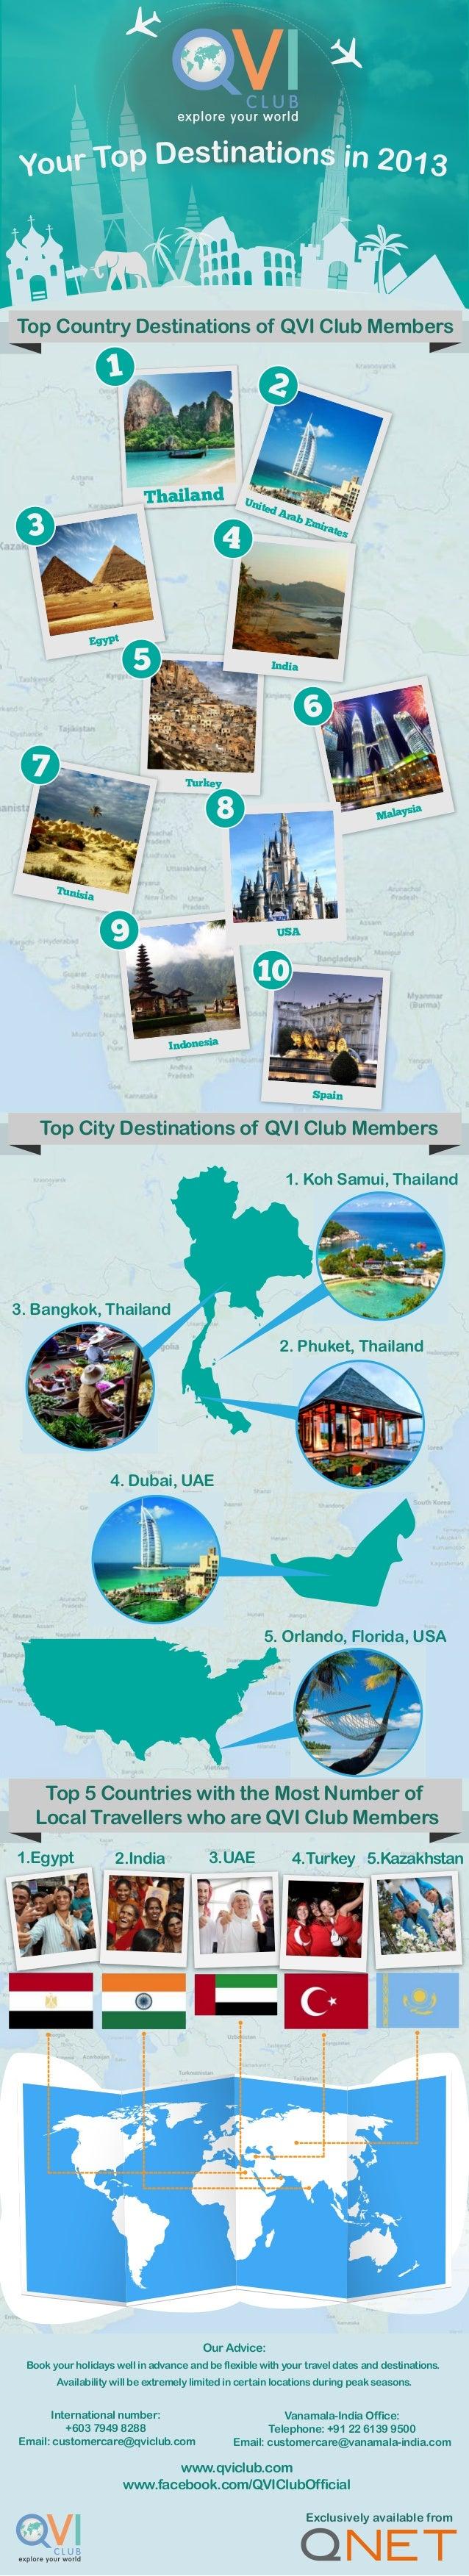 Thailand 1 United Arab Emirates 2 Egypt 3 Turkey 5 Malaysia 6 Tunisia 7 Spain 10 1. Koh Samui, Thailand 4. Dubai, UAE 3. B...